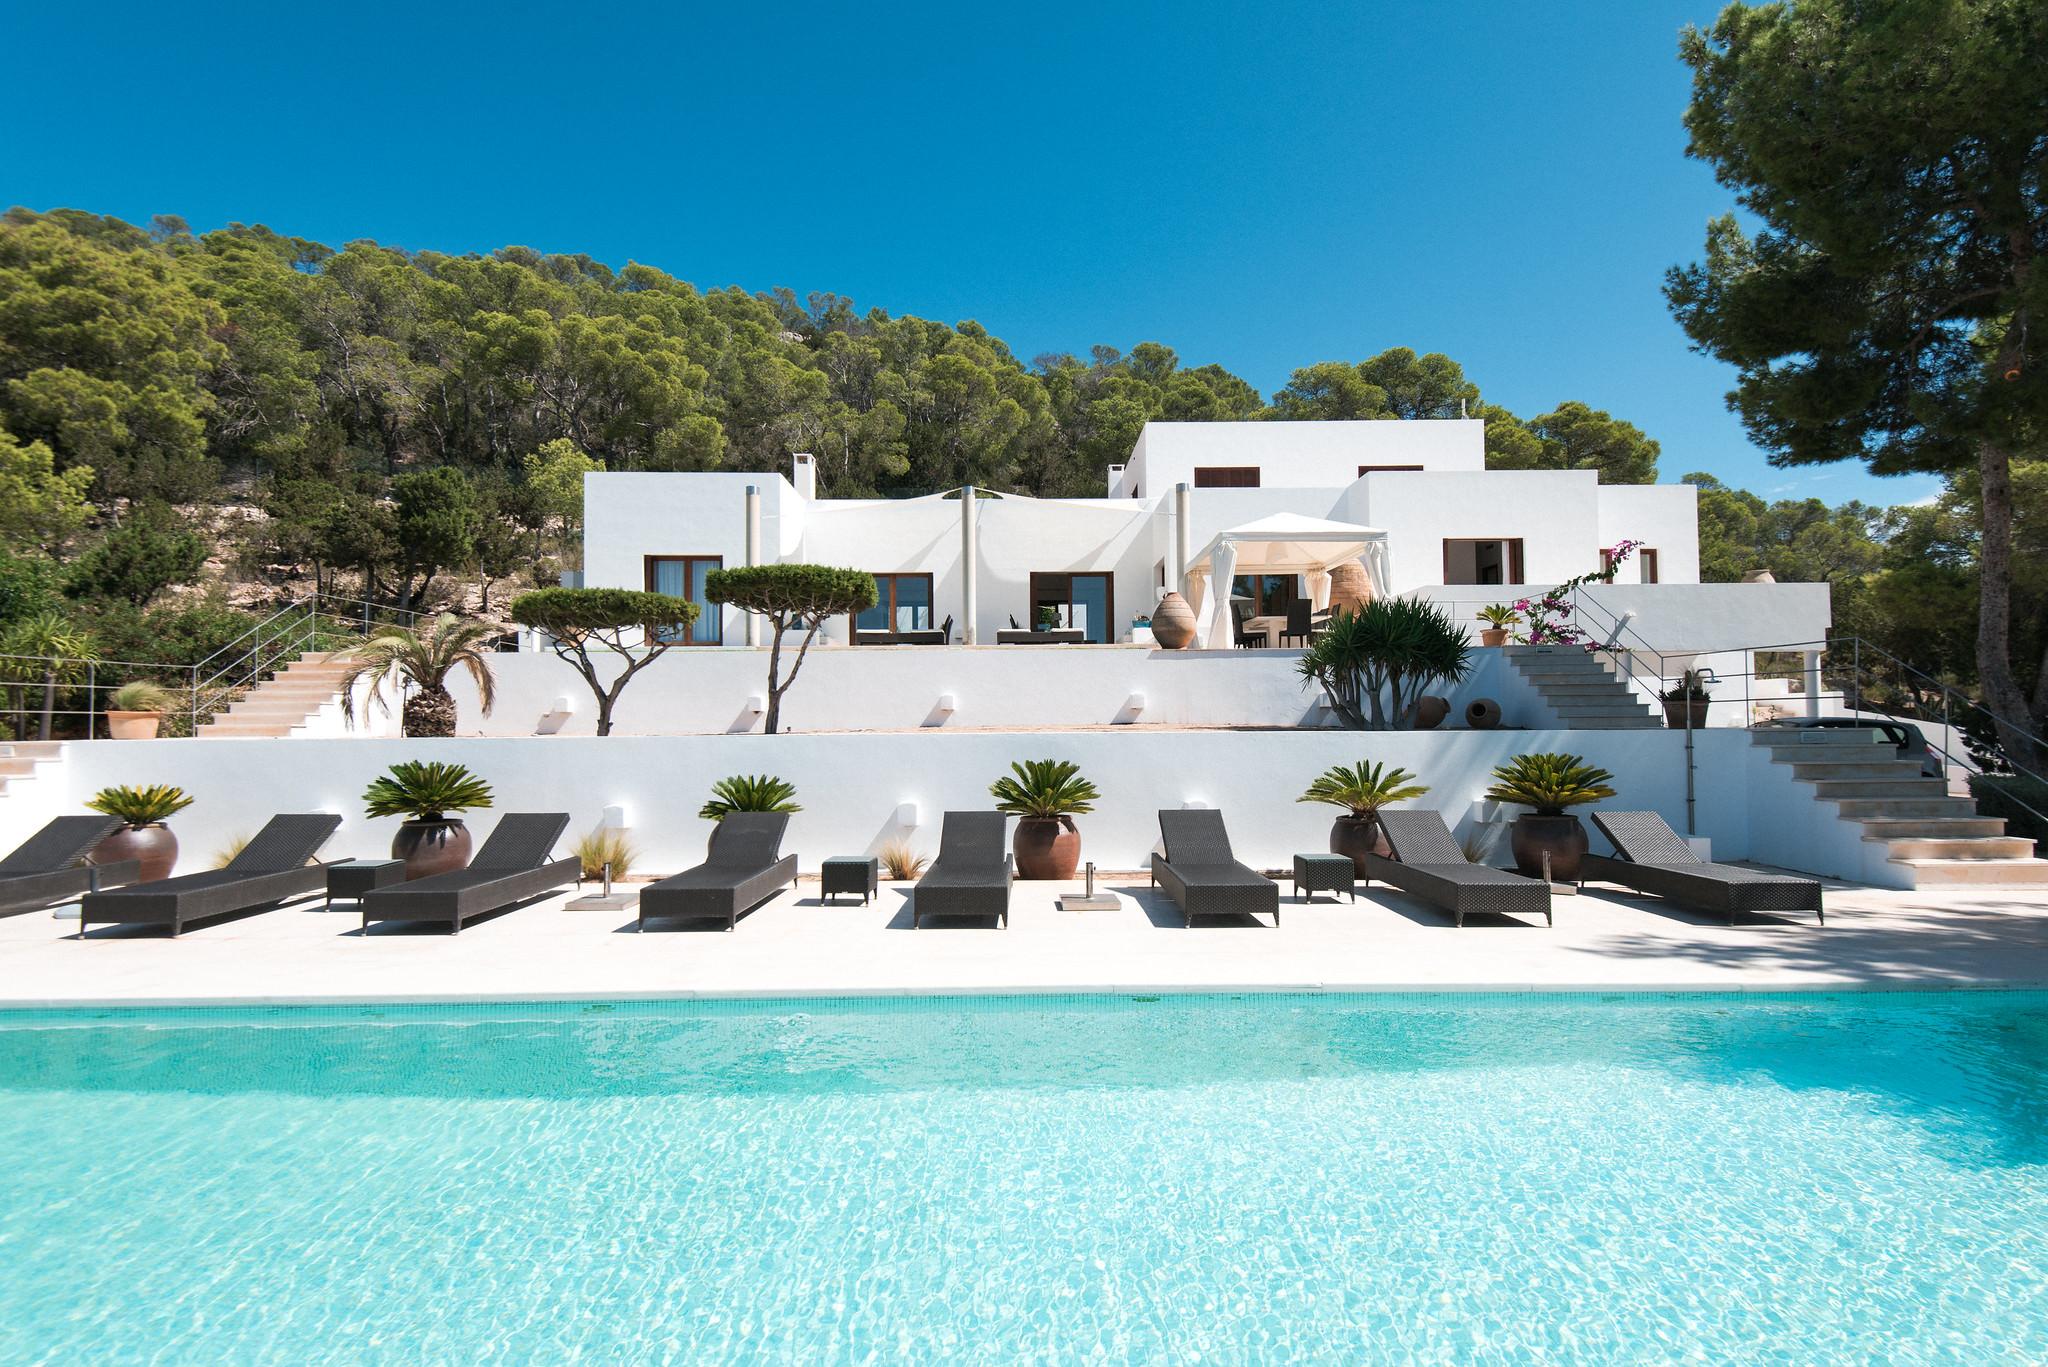 https://www.white-ibiza.com/wp-content/uploads/2020/05/white-ibiza-villas-can-ava-pool.jpg